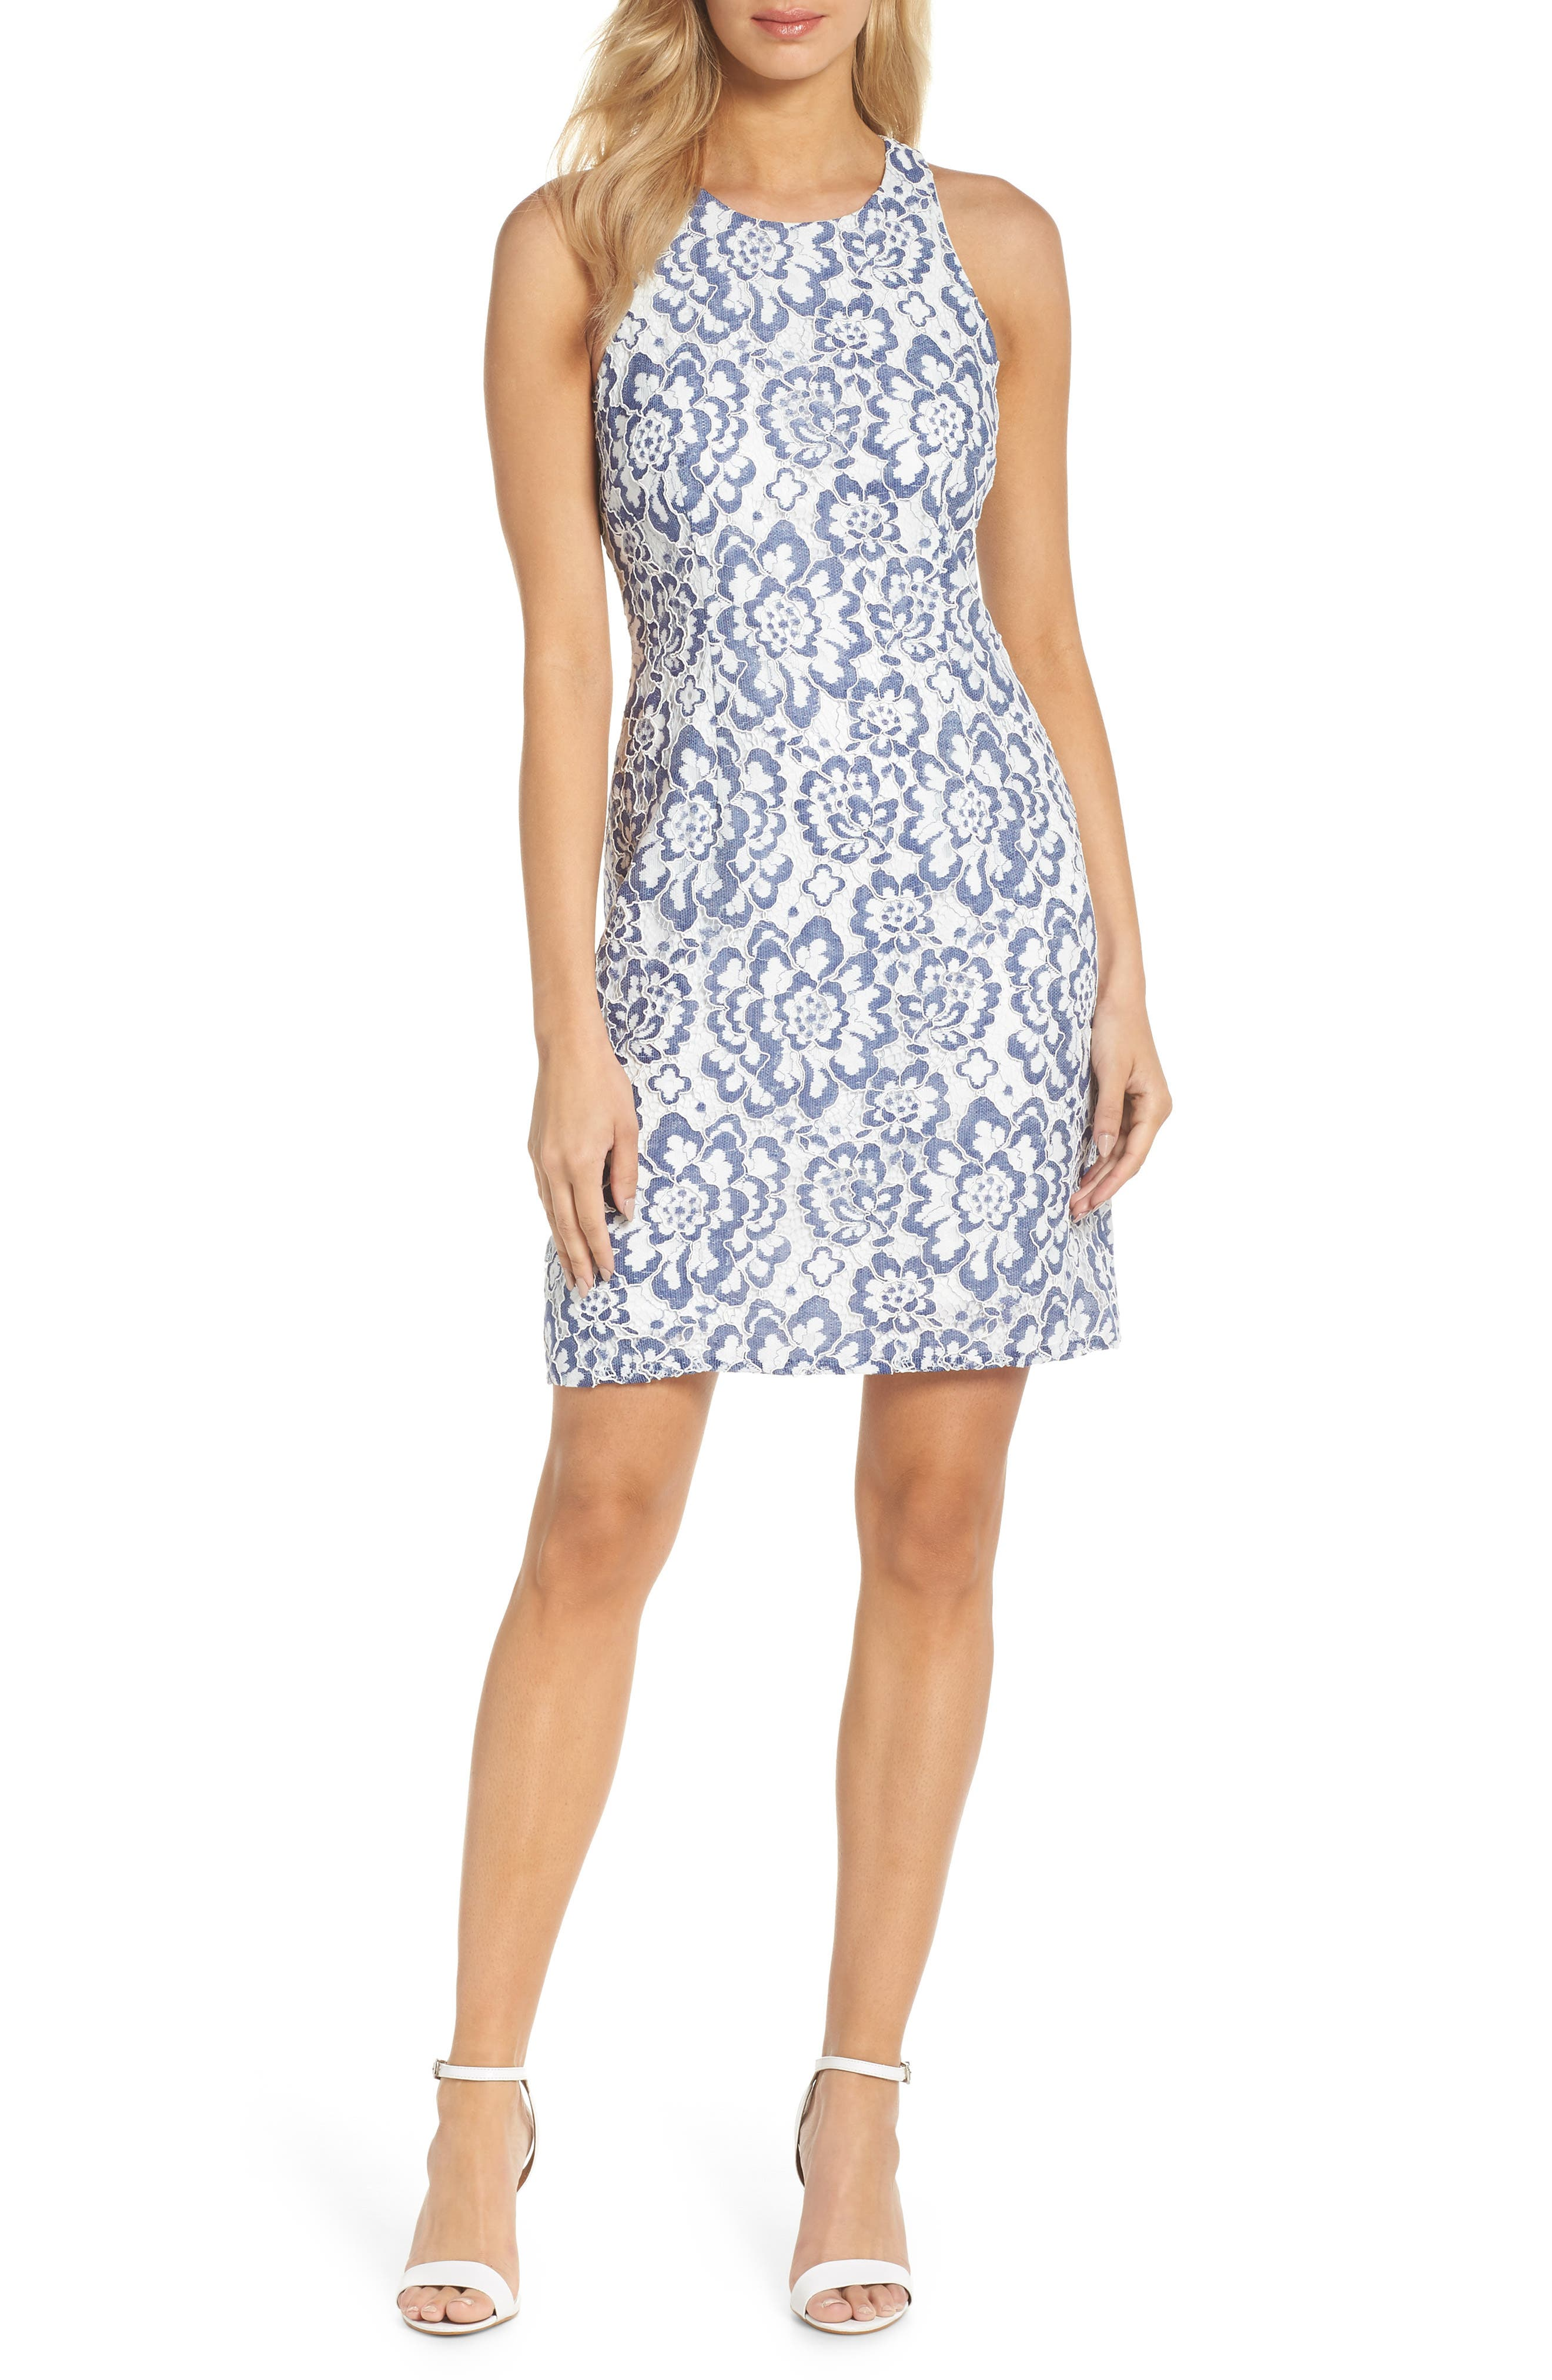 ADRIANNA PAPELL Elisa Two Tone Lace Sheath Dress, Main, color, 481